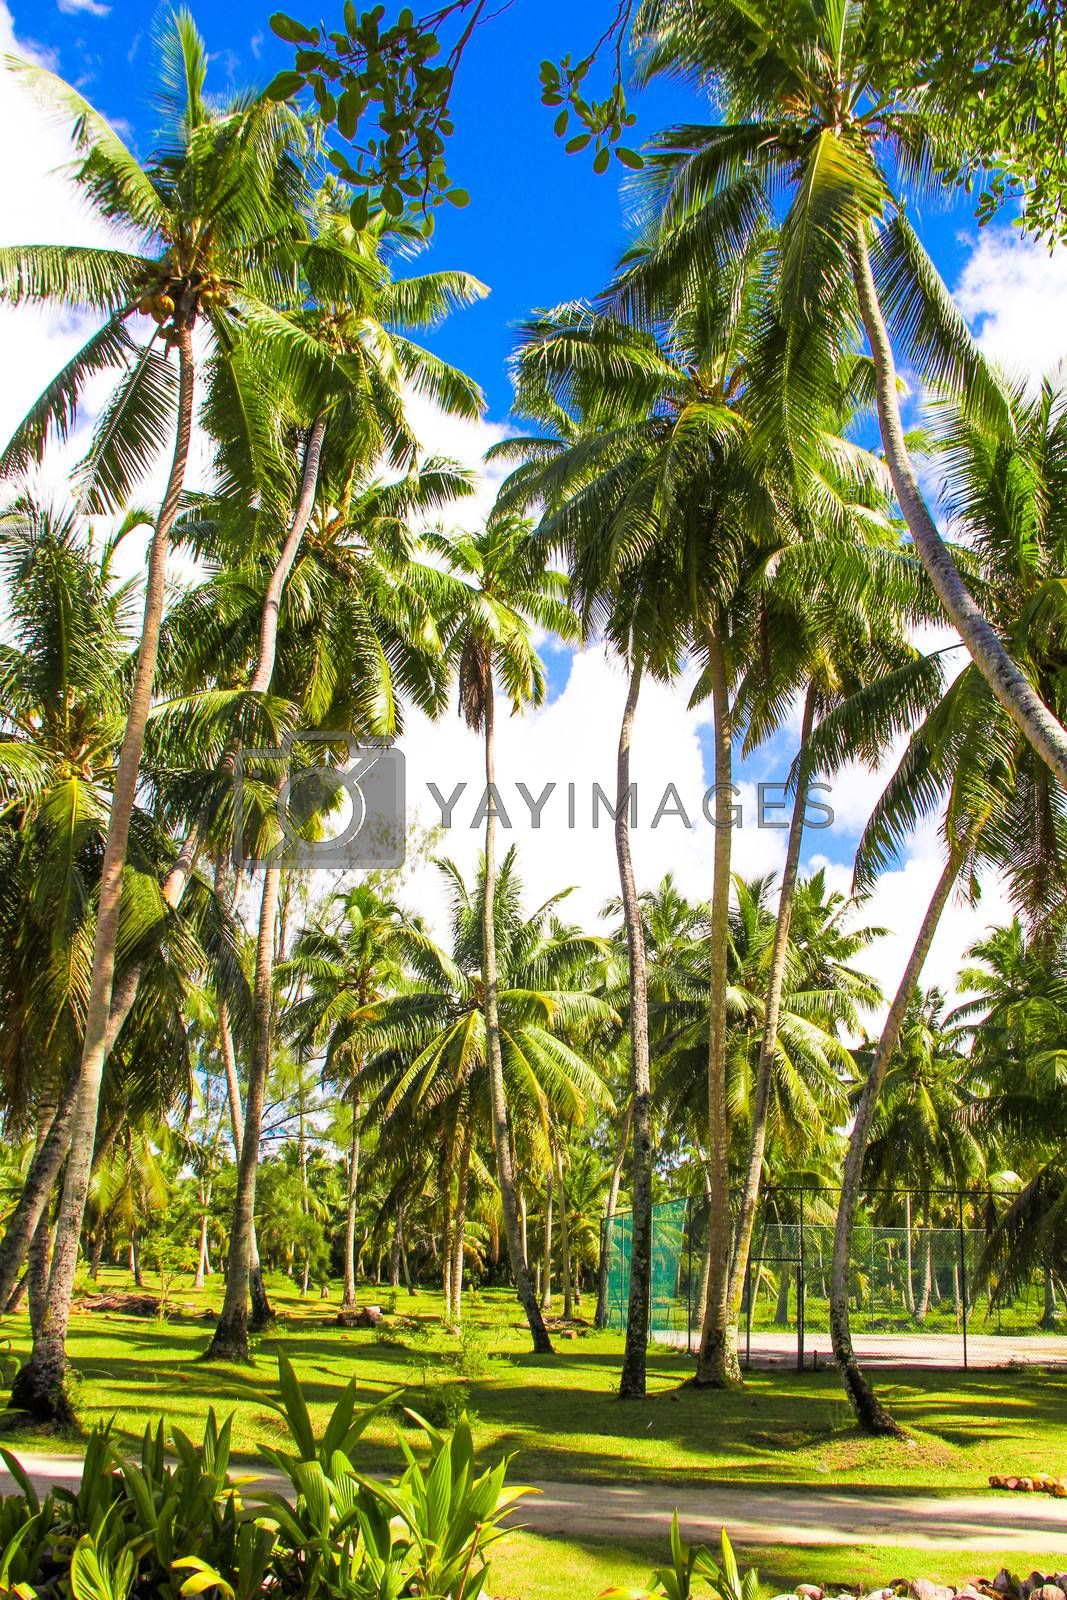 Coconut Palm trees on the sandy beach in Seyshelles